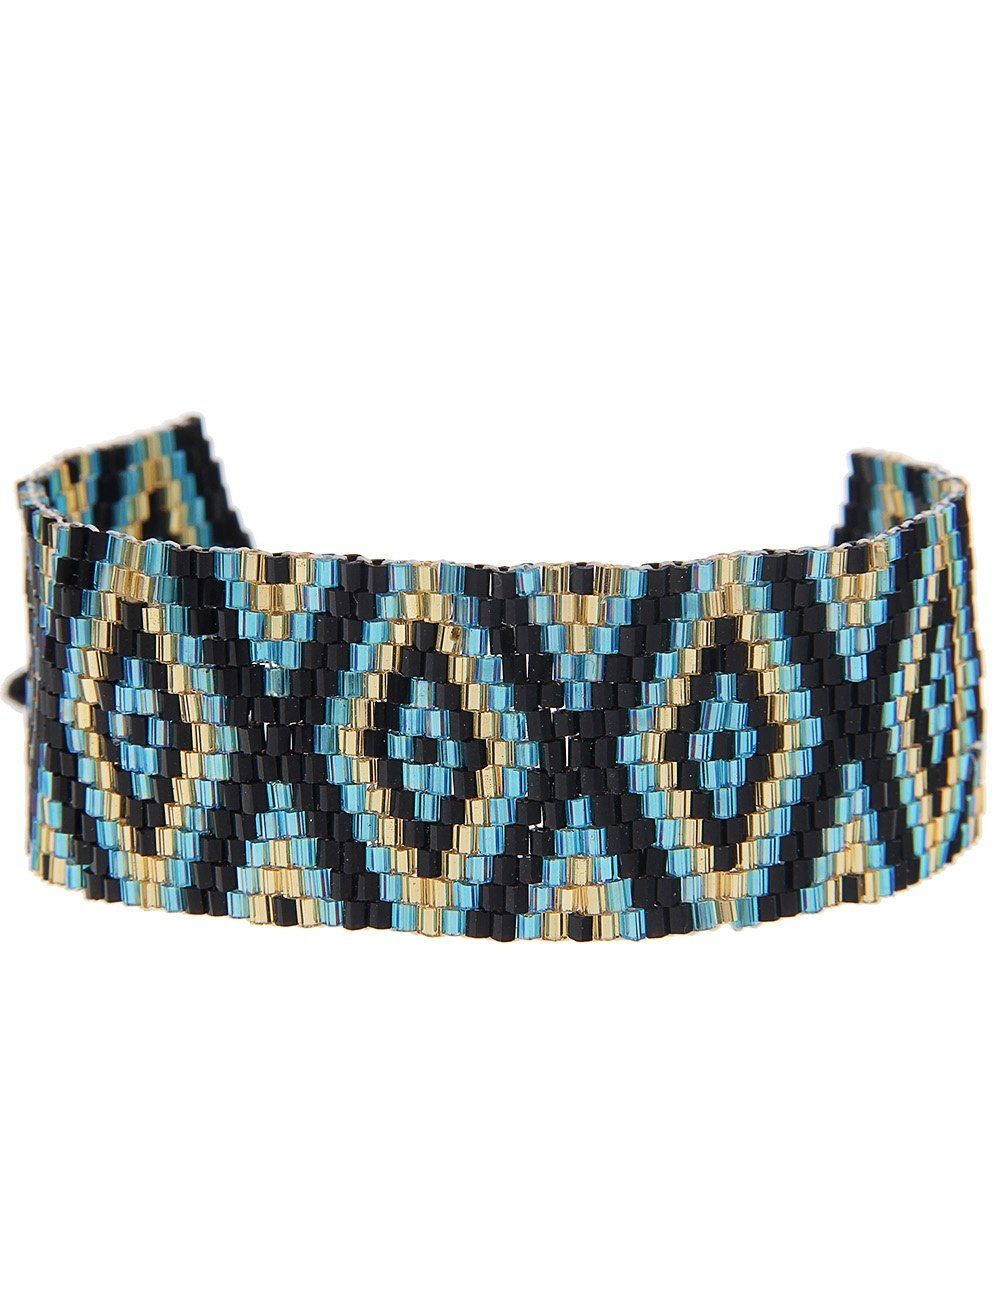 Leslii Armband mit tollem Webmuster